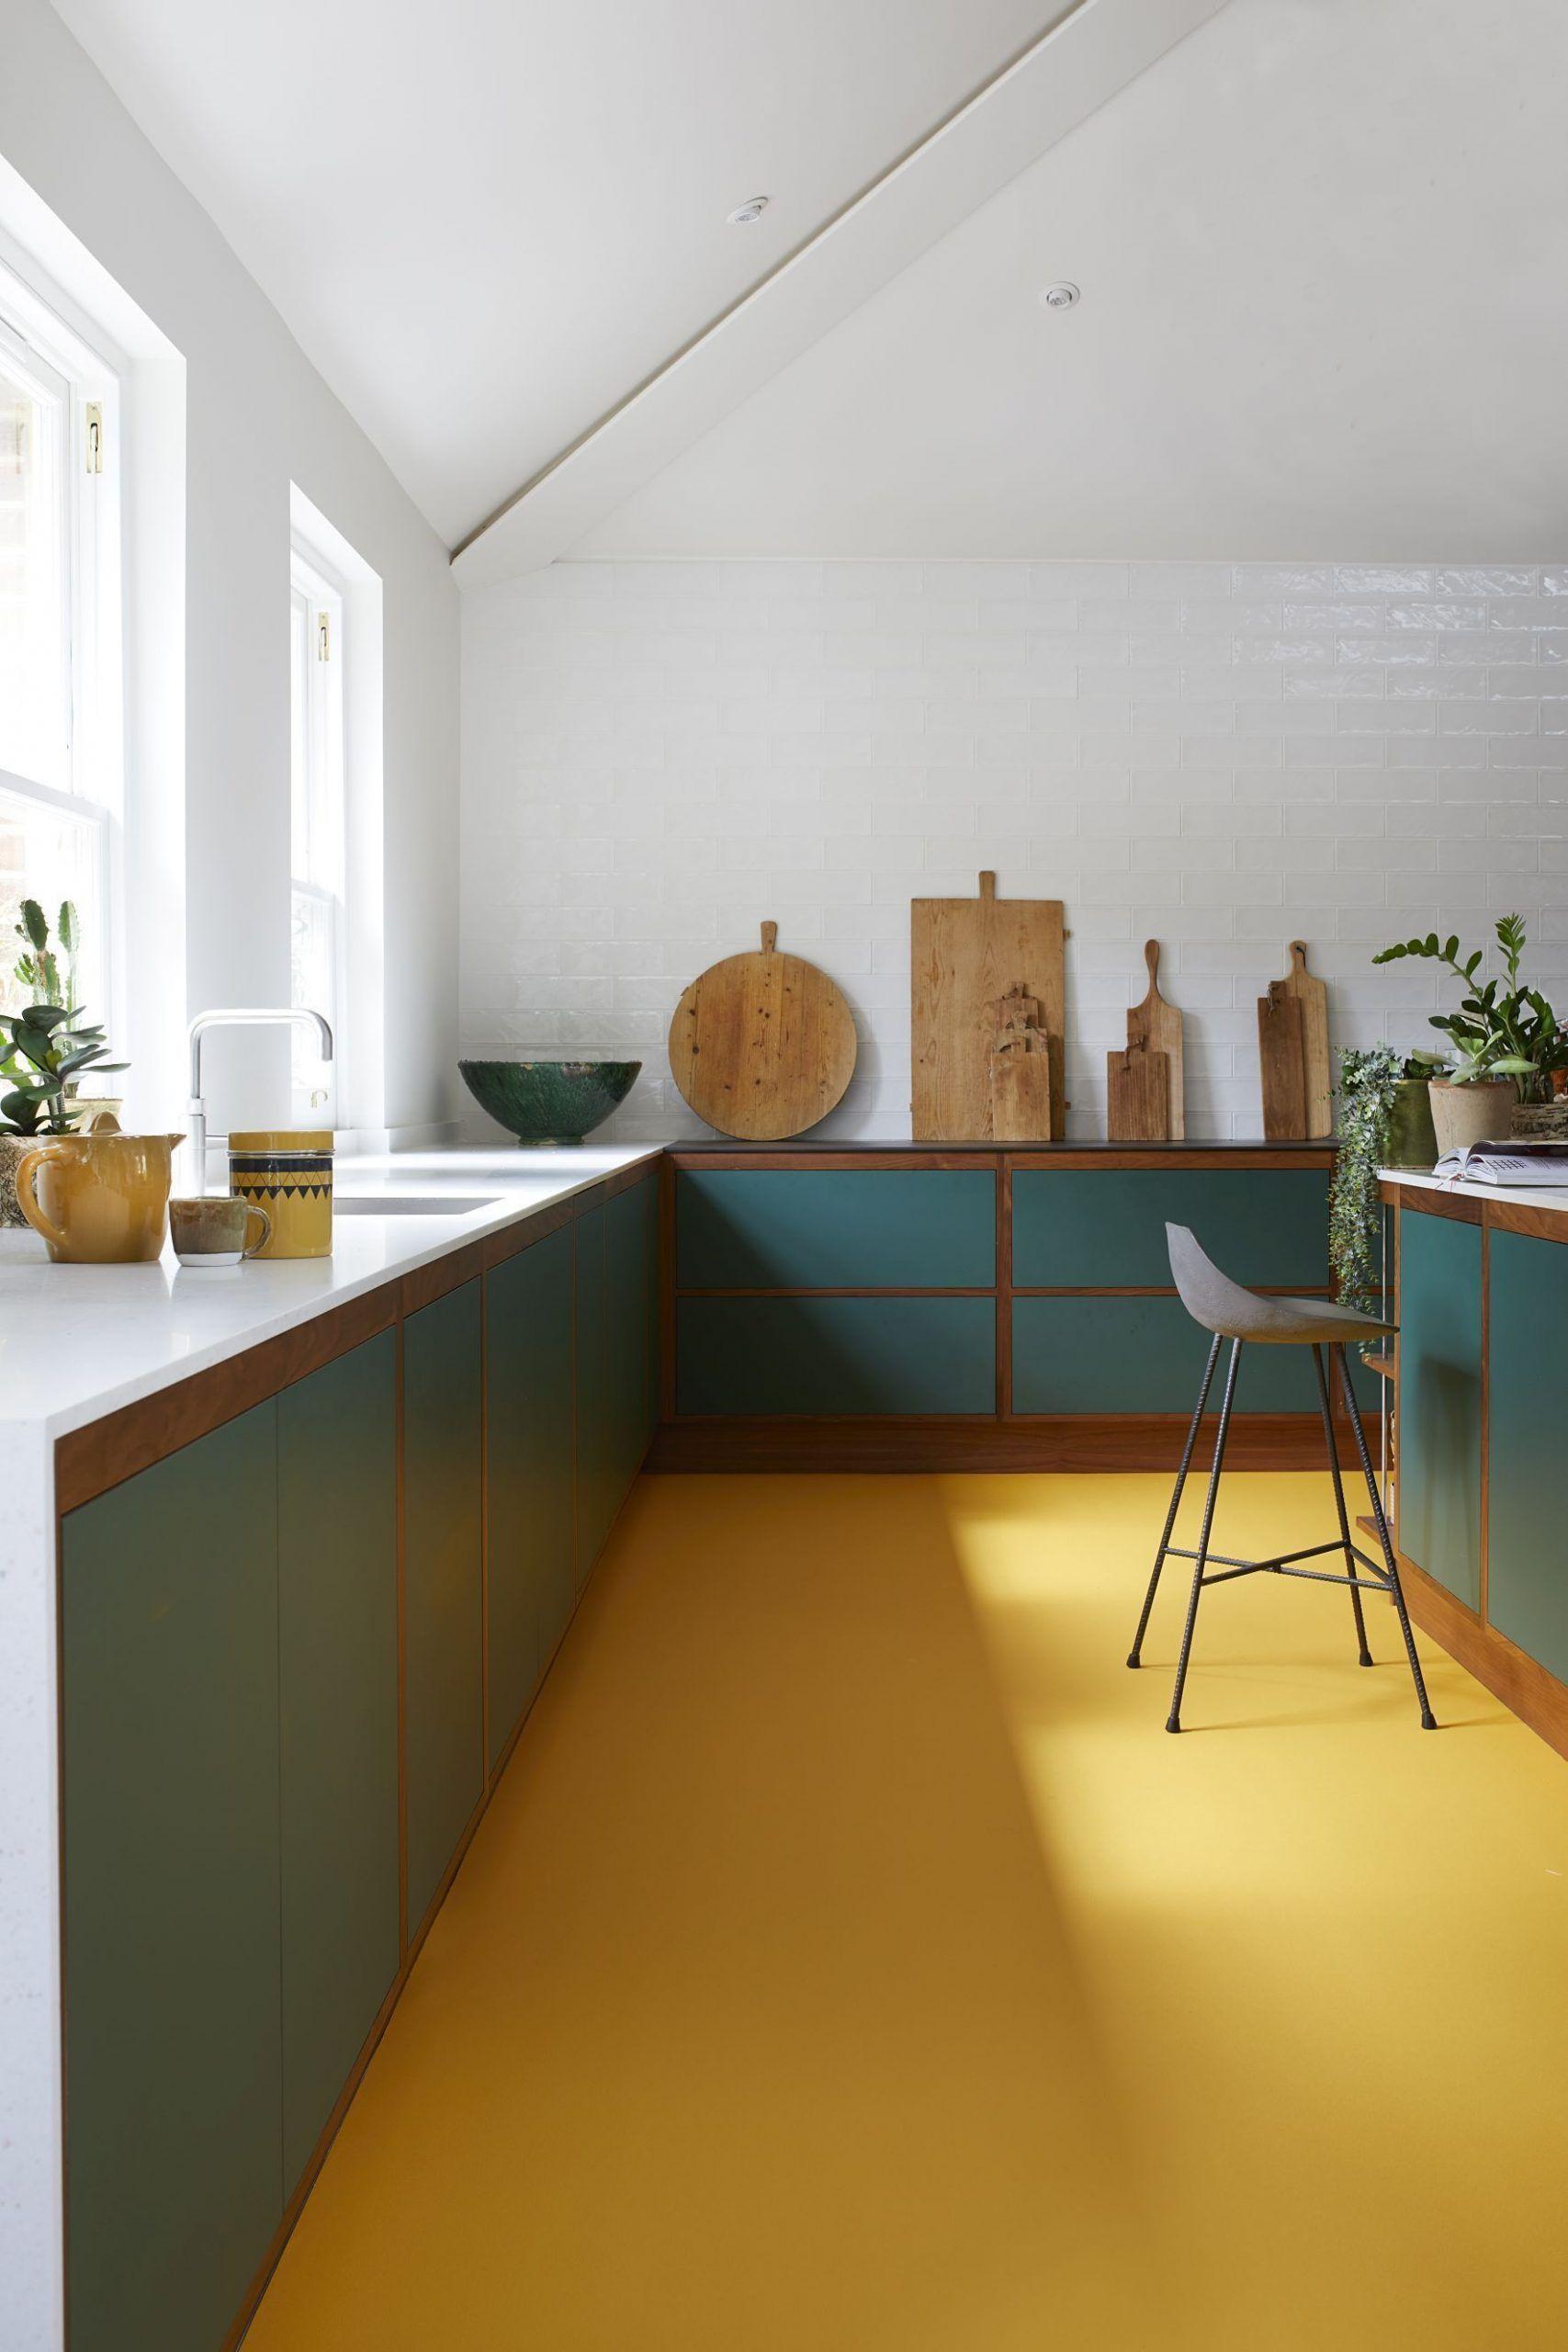 Welcome to the blog bold orange kitchen decor ideas - decorars.com